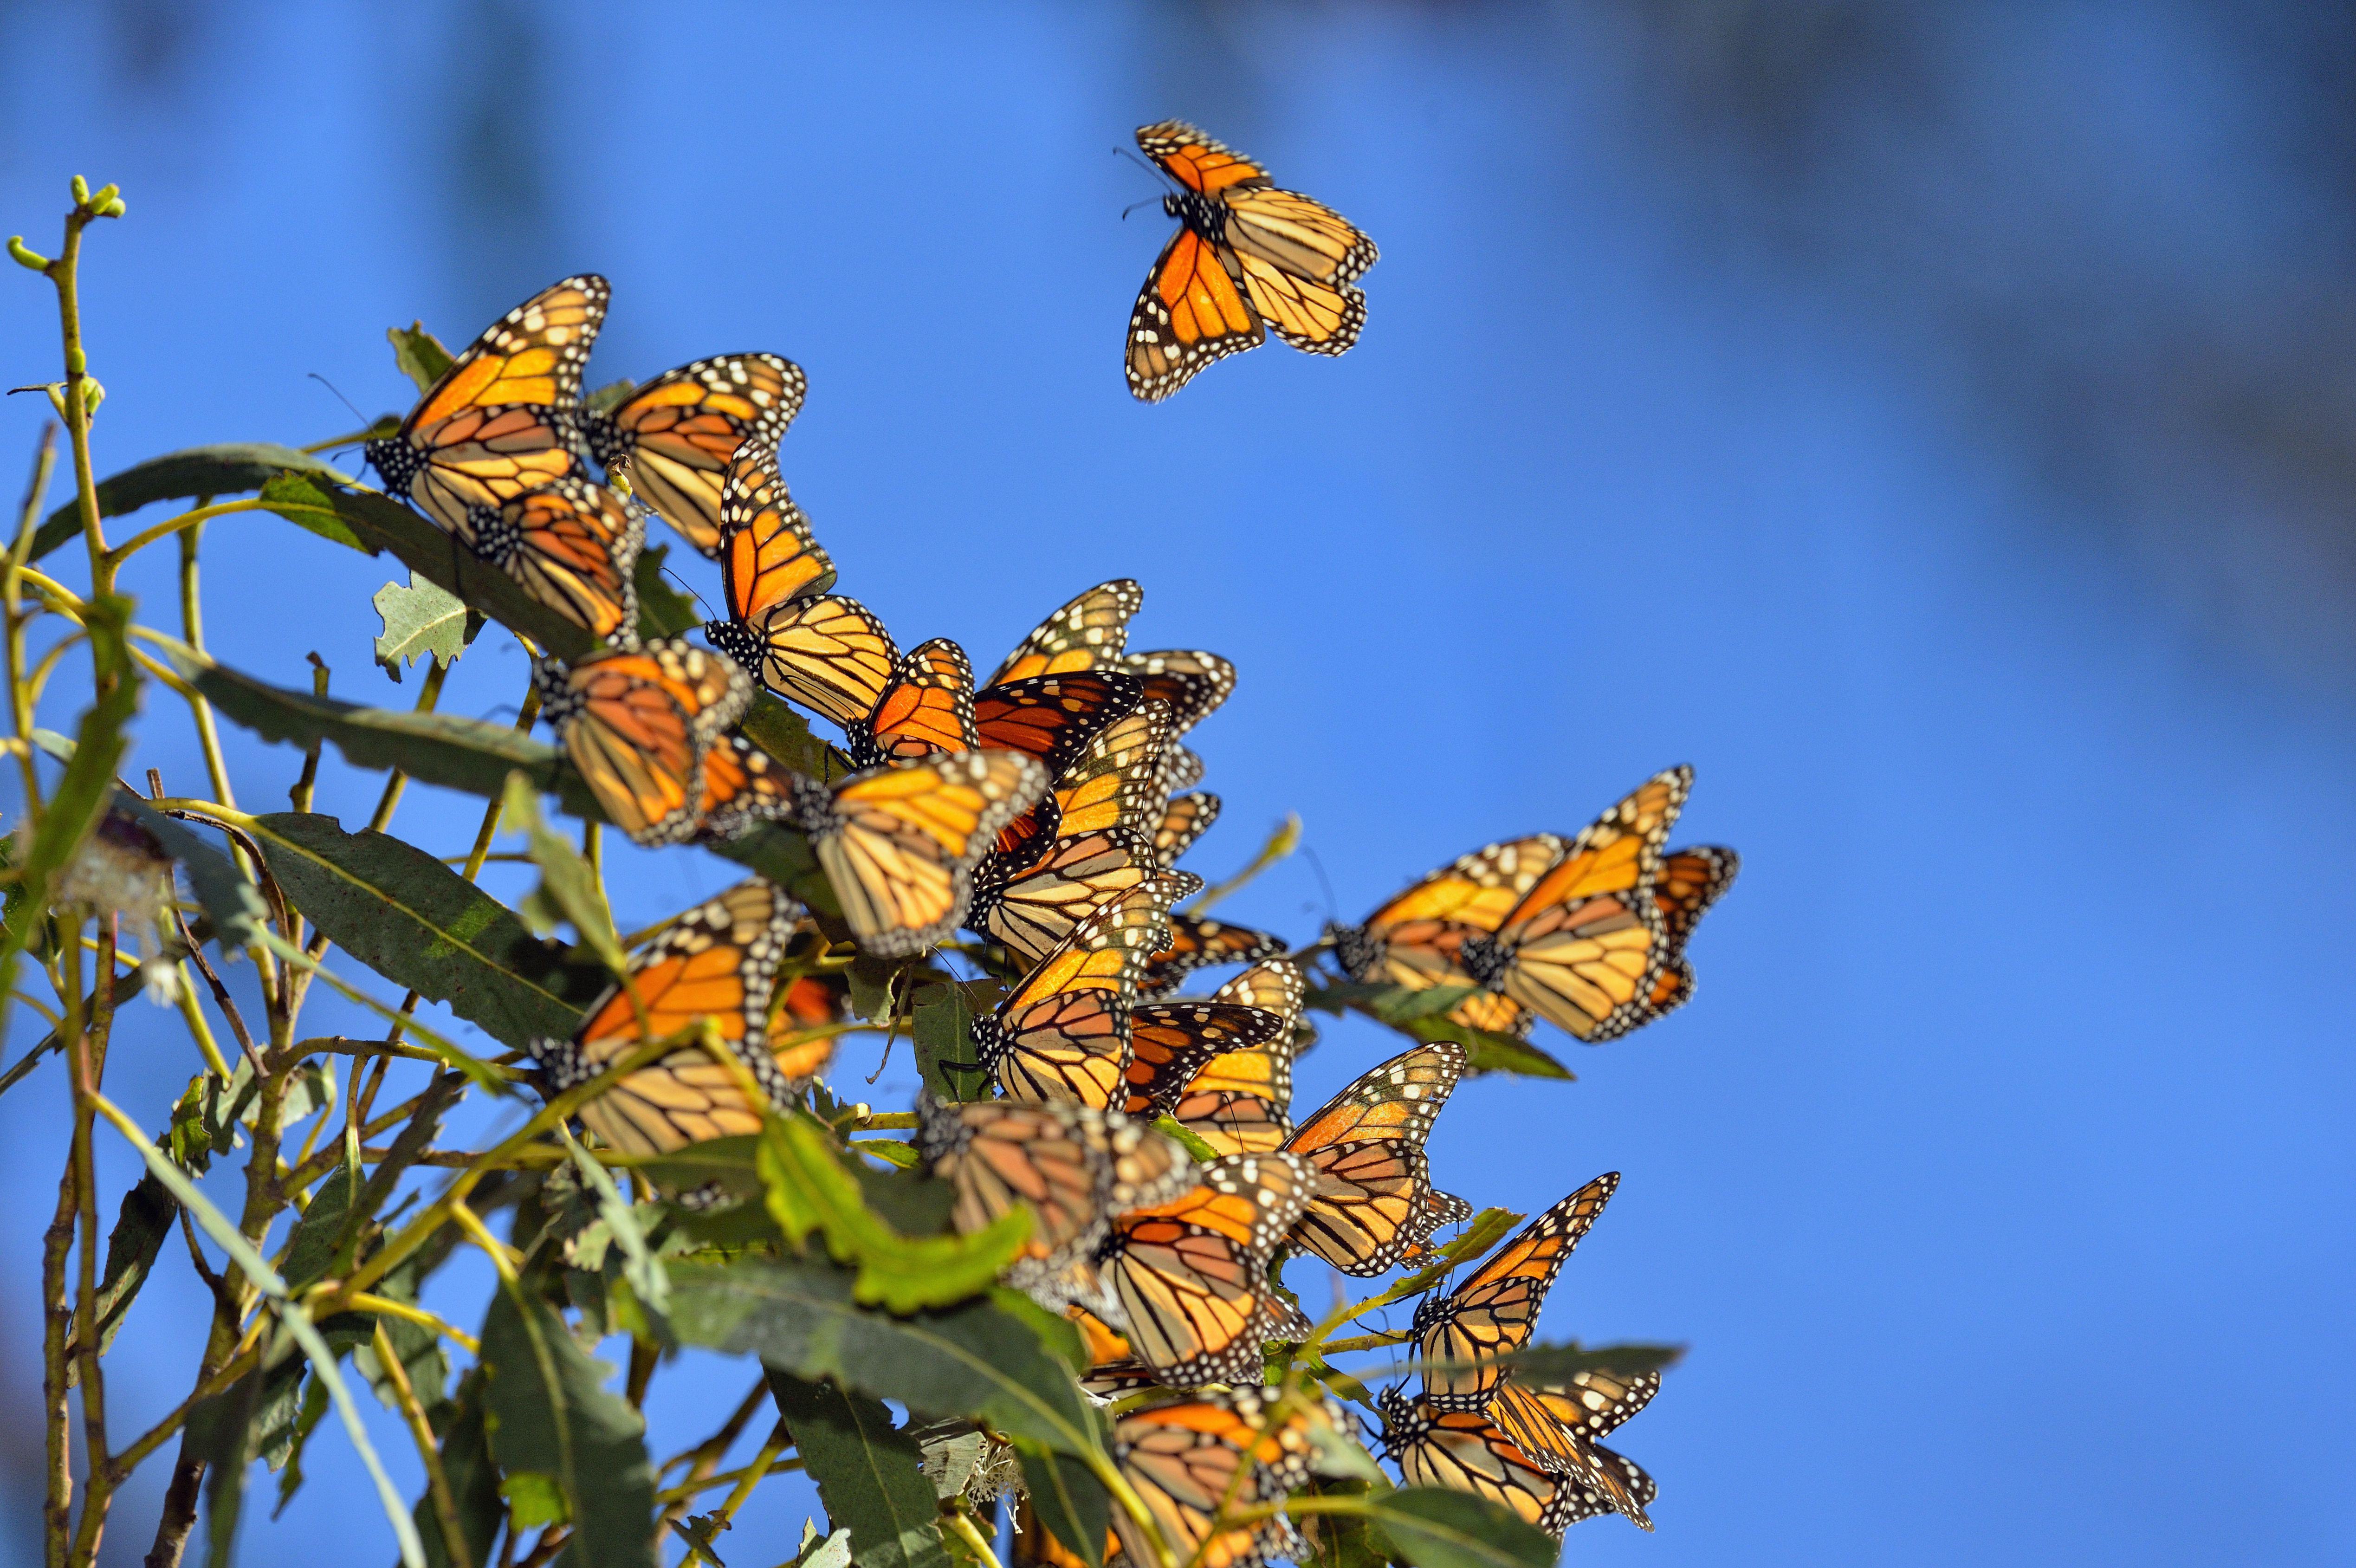 Monarch, Danaus plexippus, Winter colony roosting in eucalyptus tree, Pismo Beach State Park, California, USA